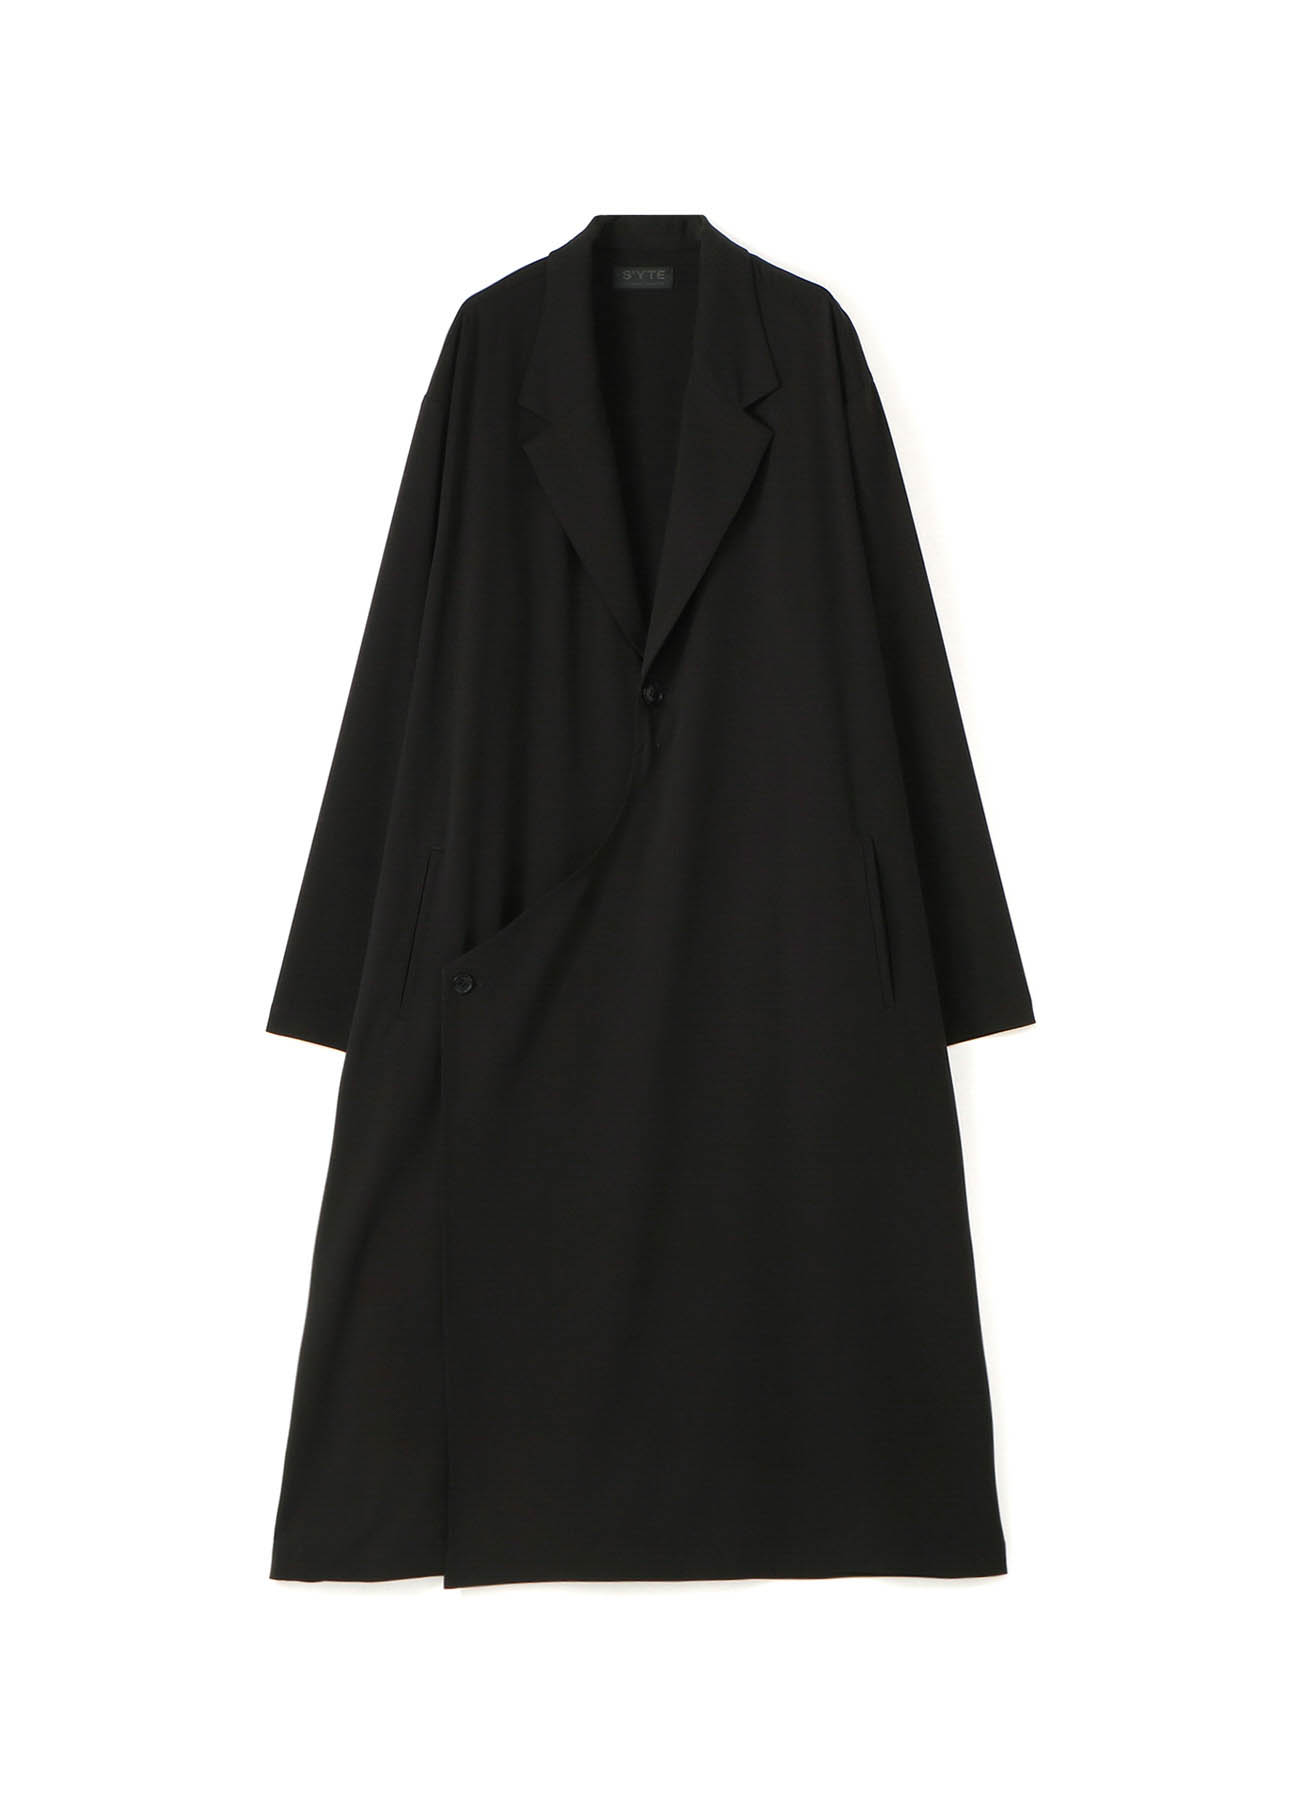 Pe/Rayon Gabardine Stretch Tailored Wrap Dress